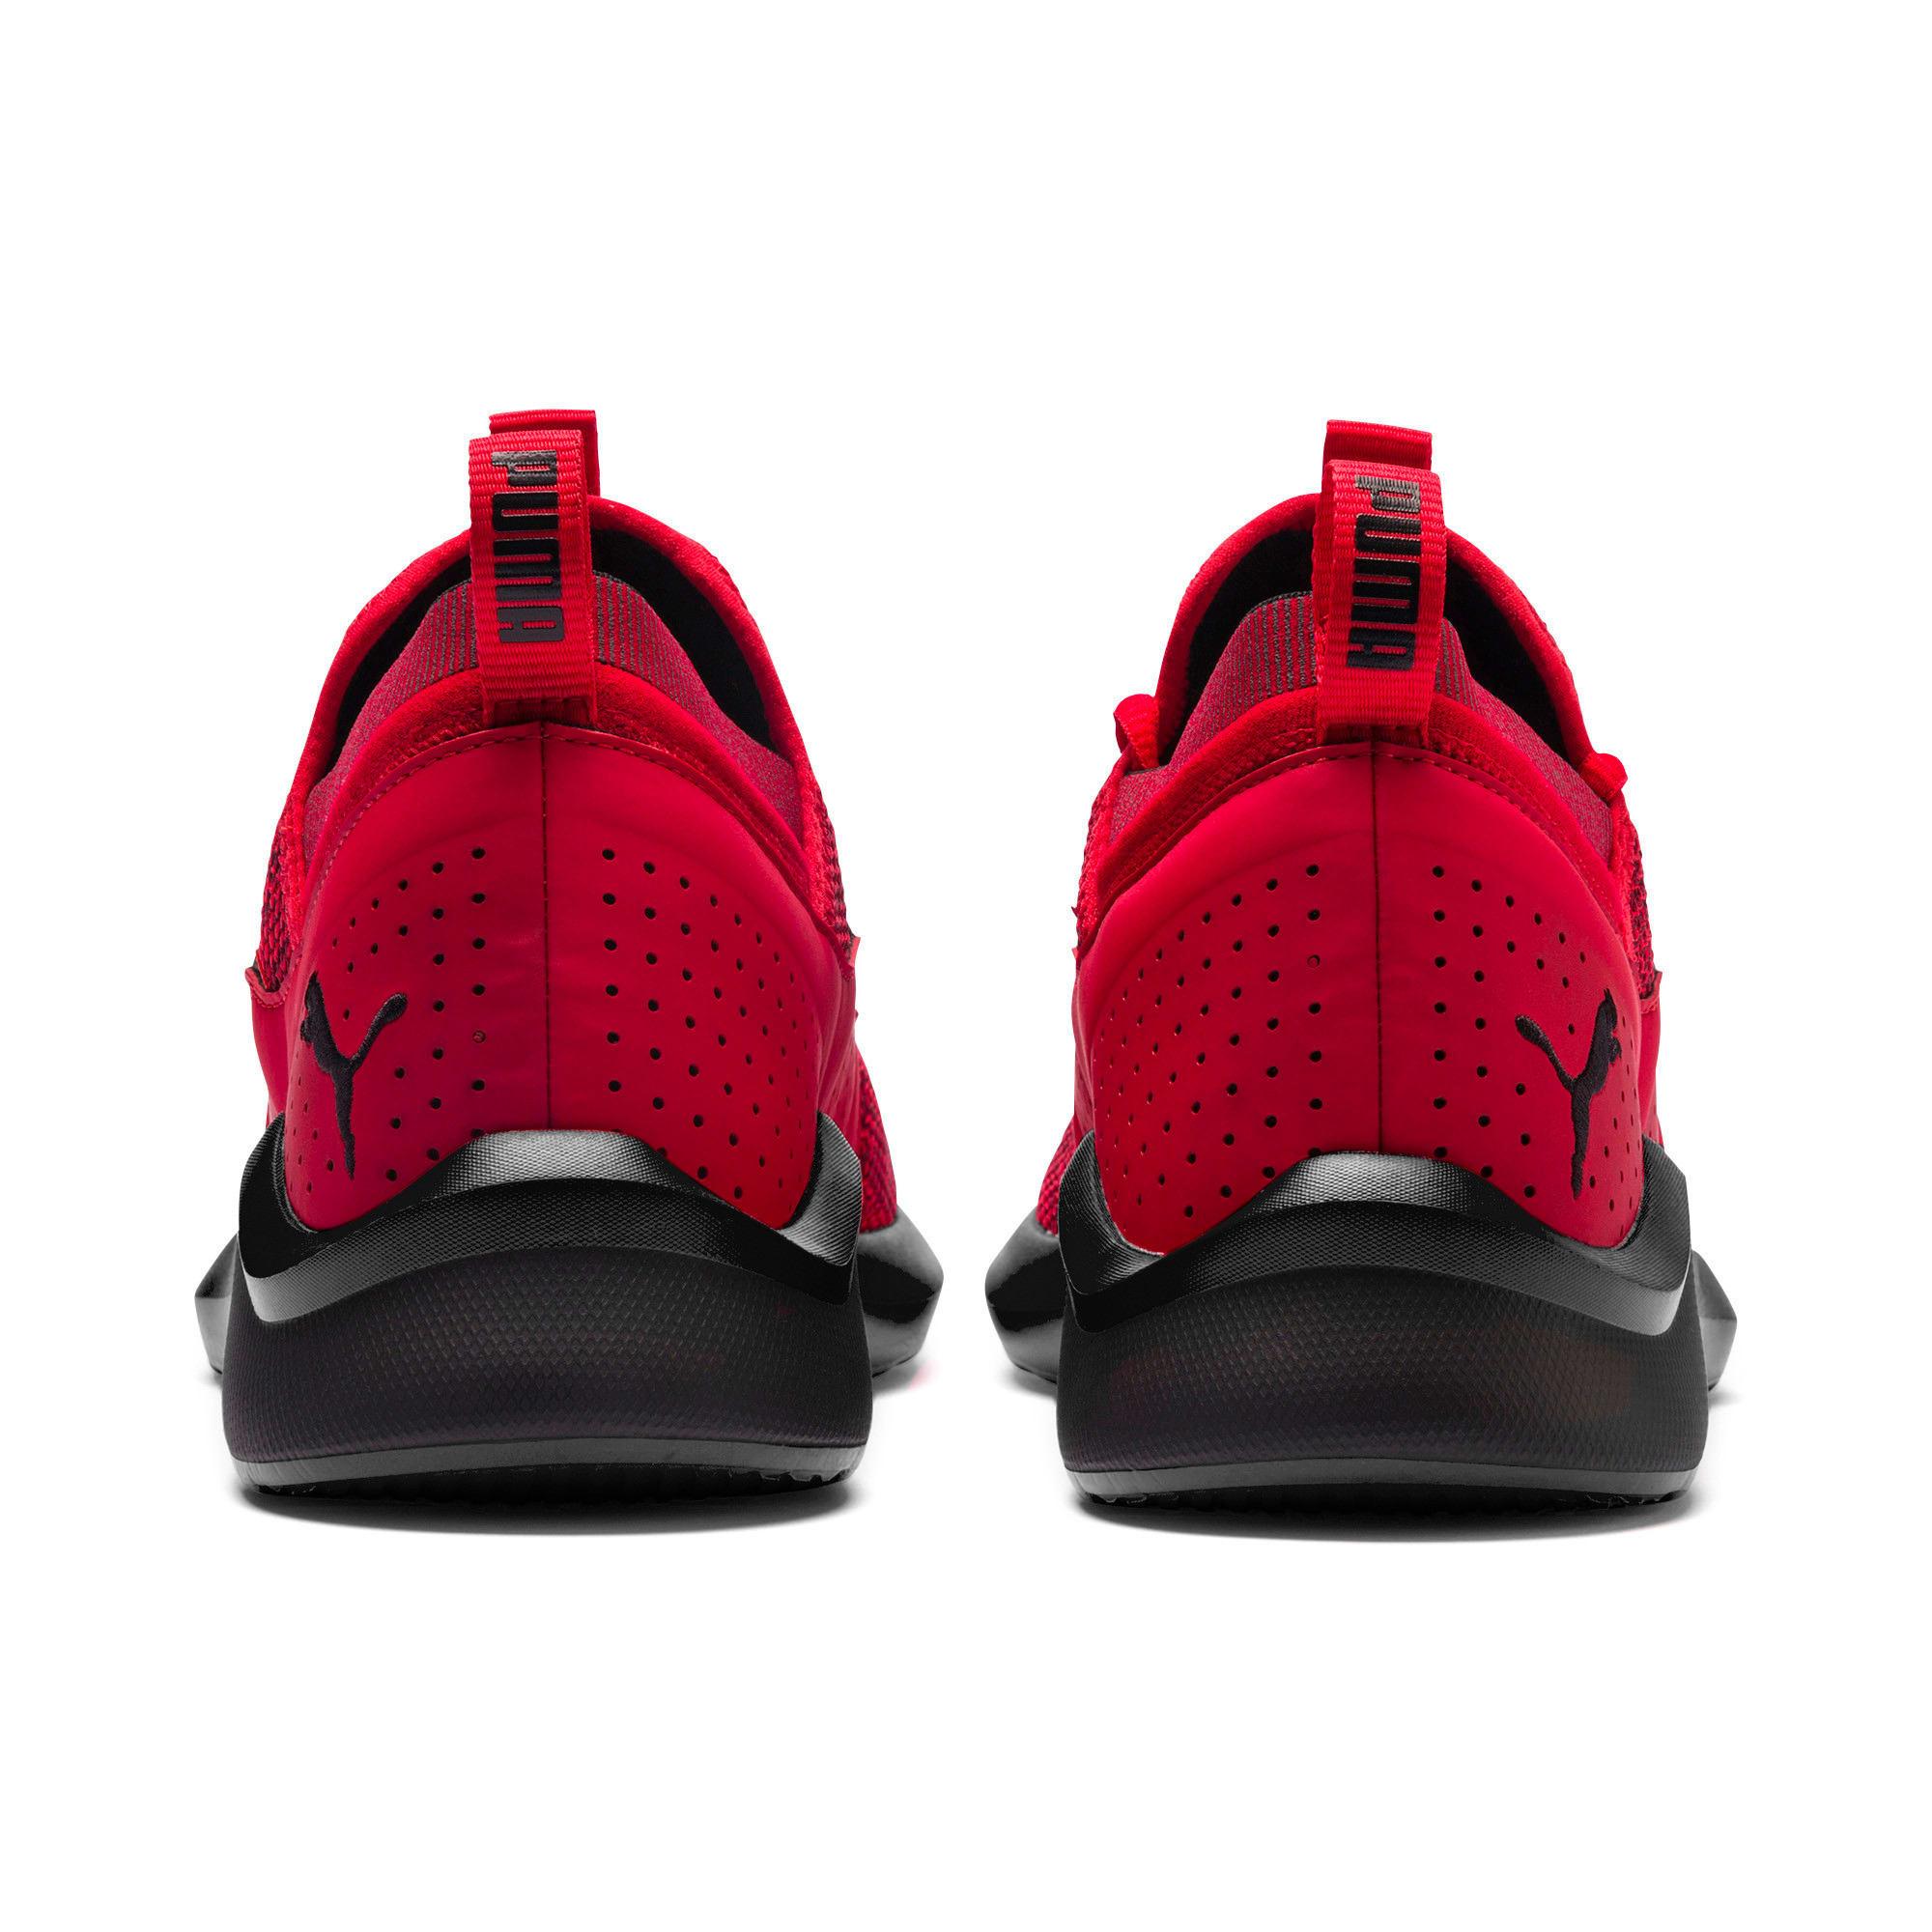 Thumbnail 3 of Emergence Men's Running Shoes, High Risk Red-Puma Black, medium-IND